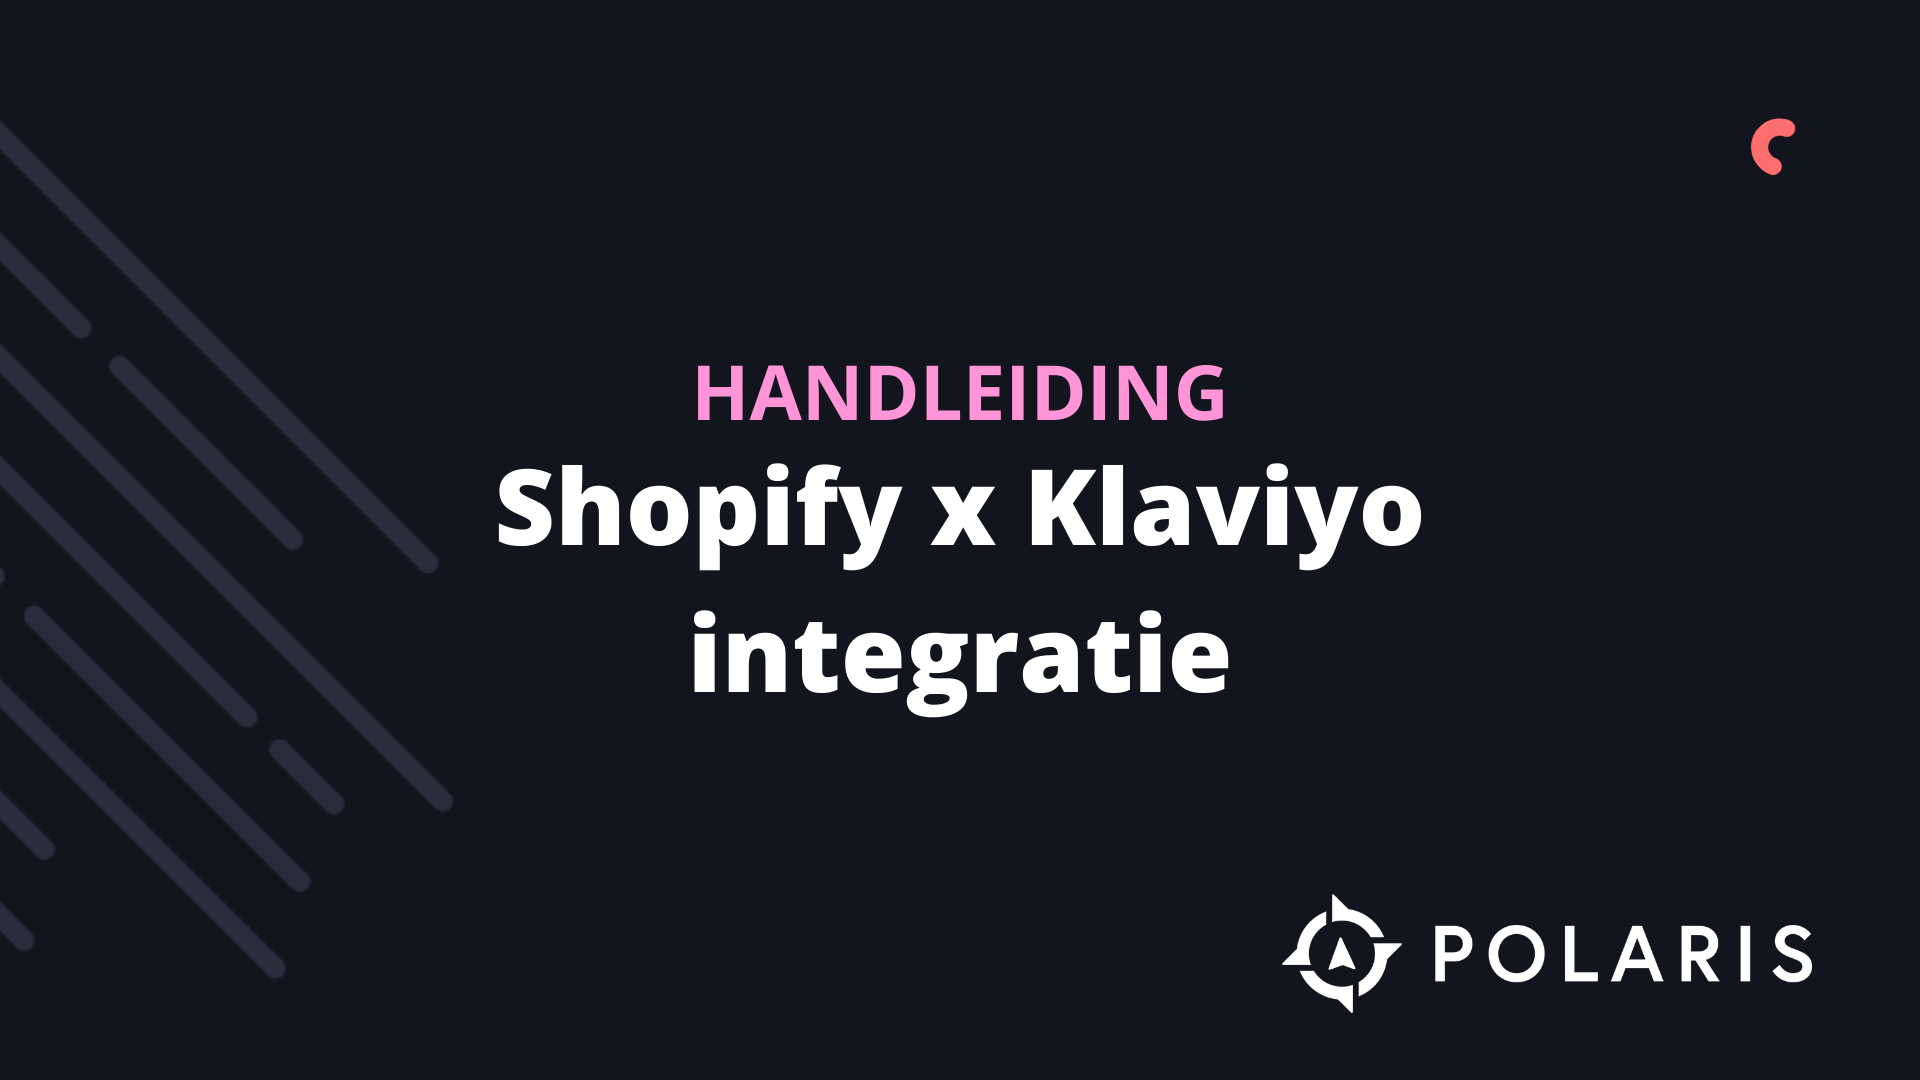 Shopify x Klaviyo integratie